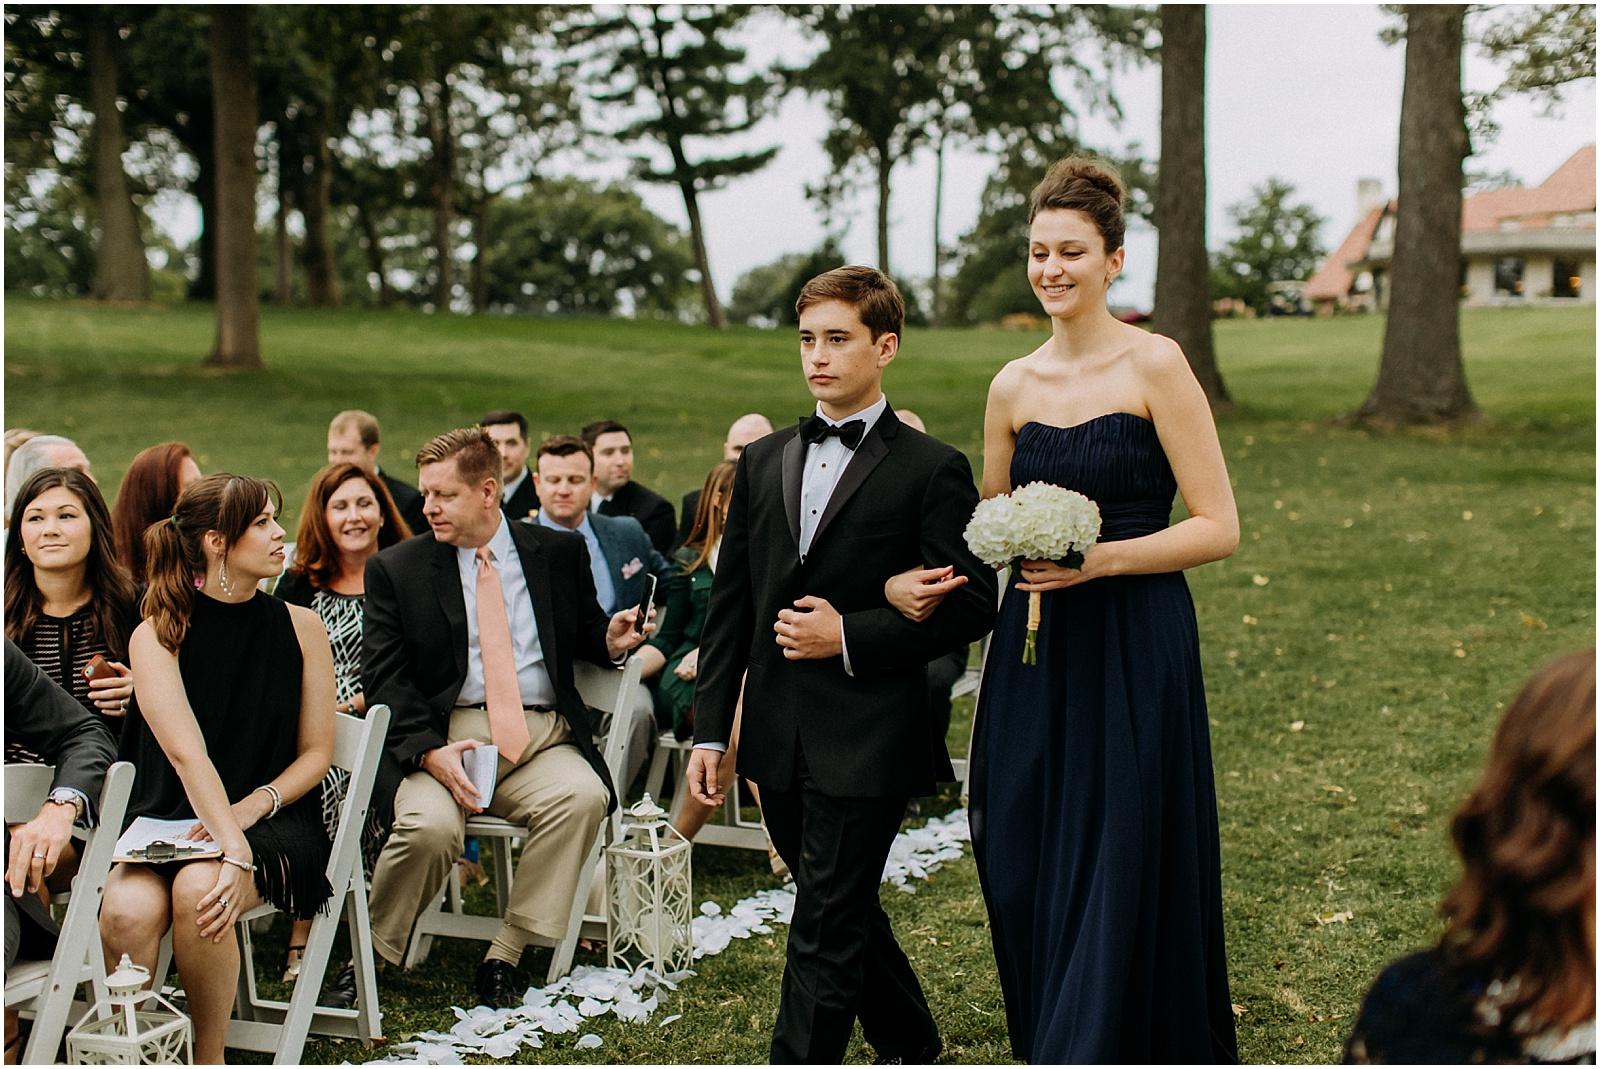 glen_echo_st_louis_mo_wedding_0094.jpg